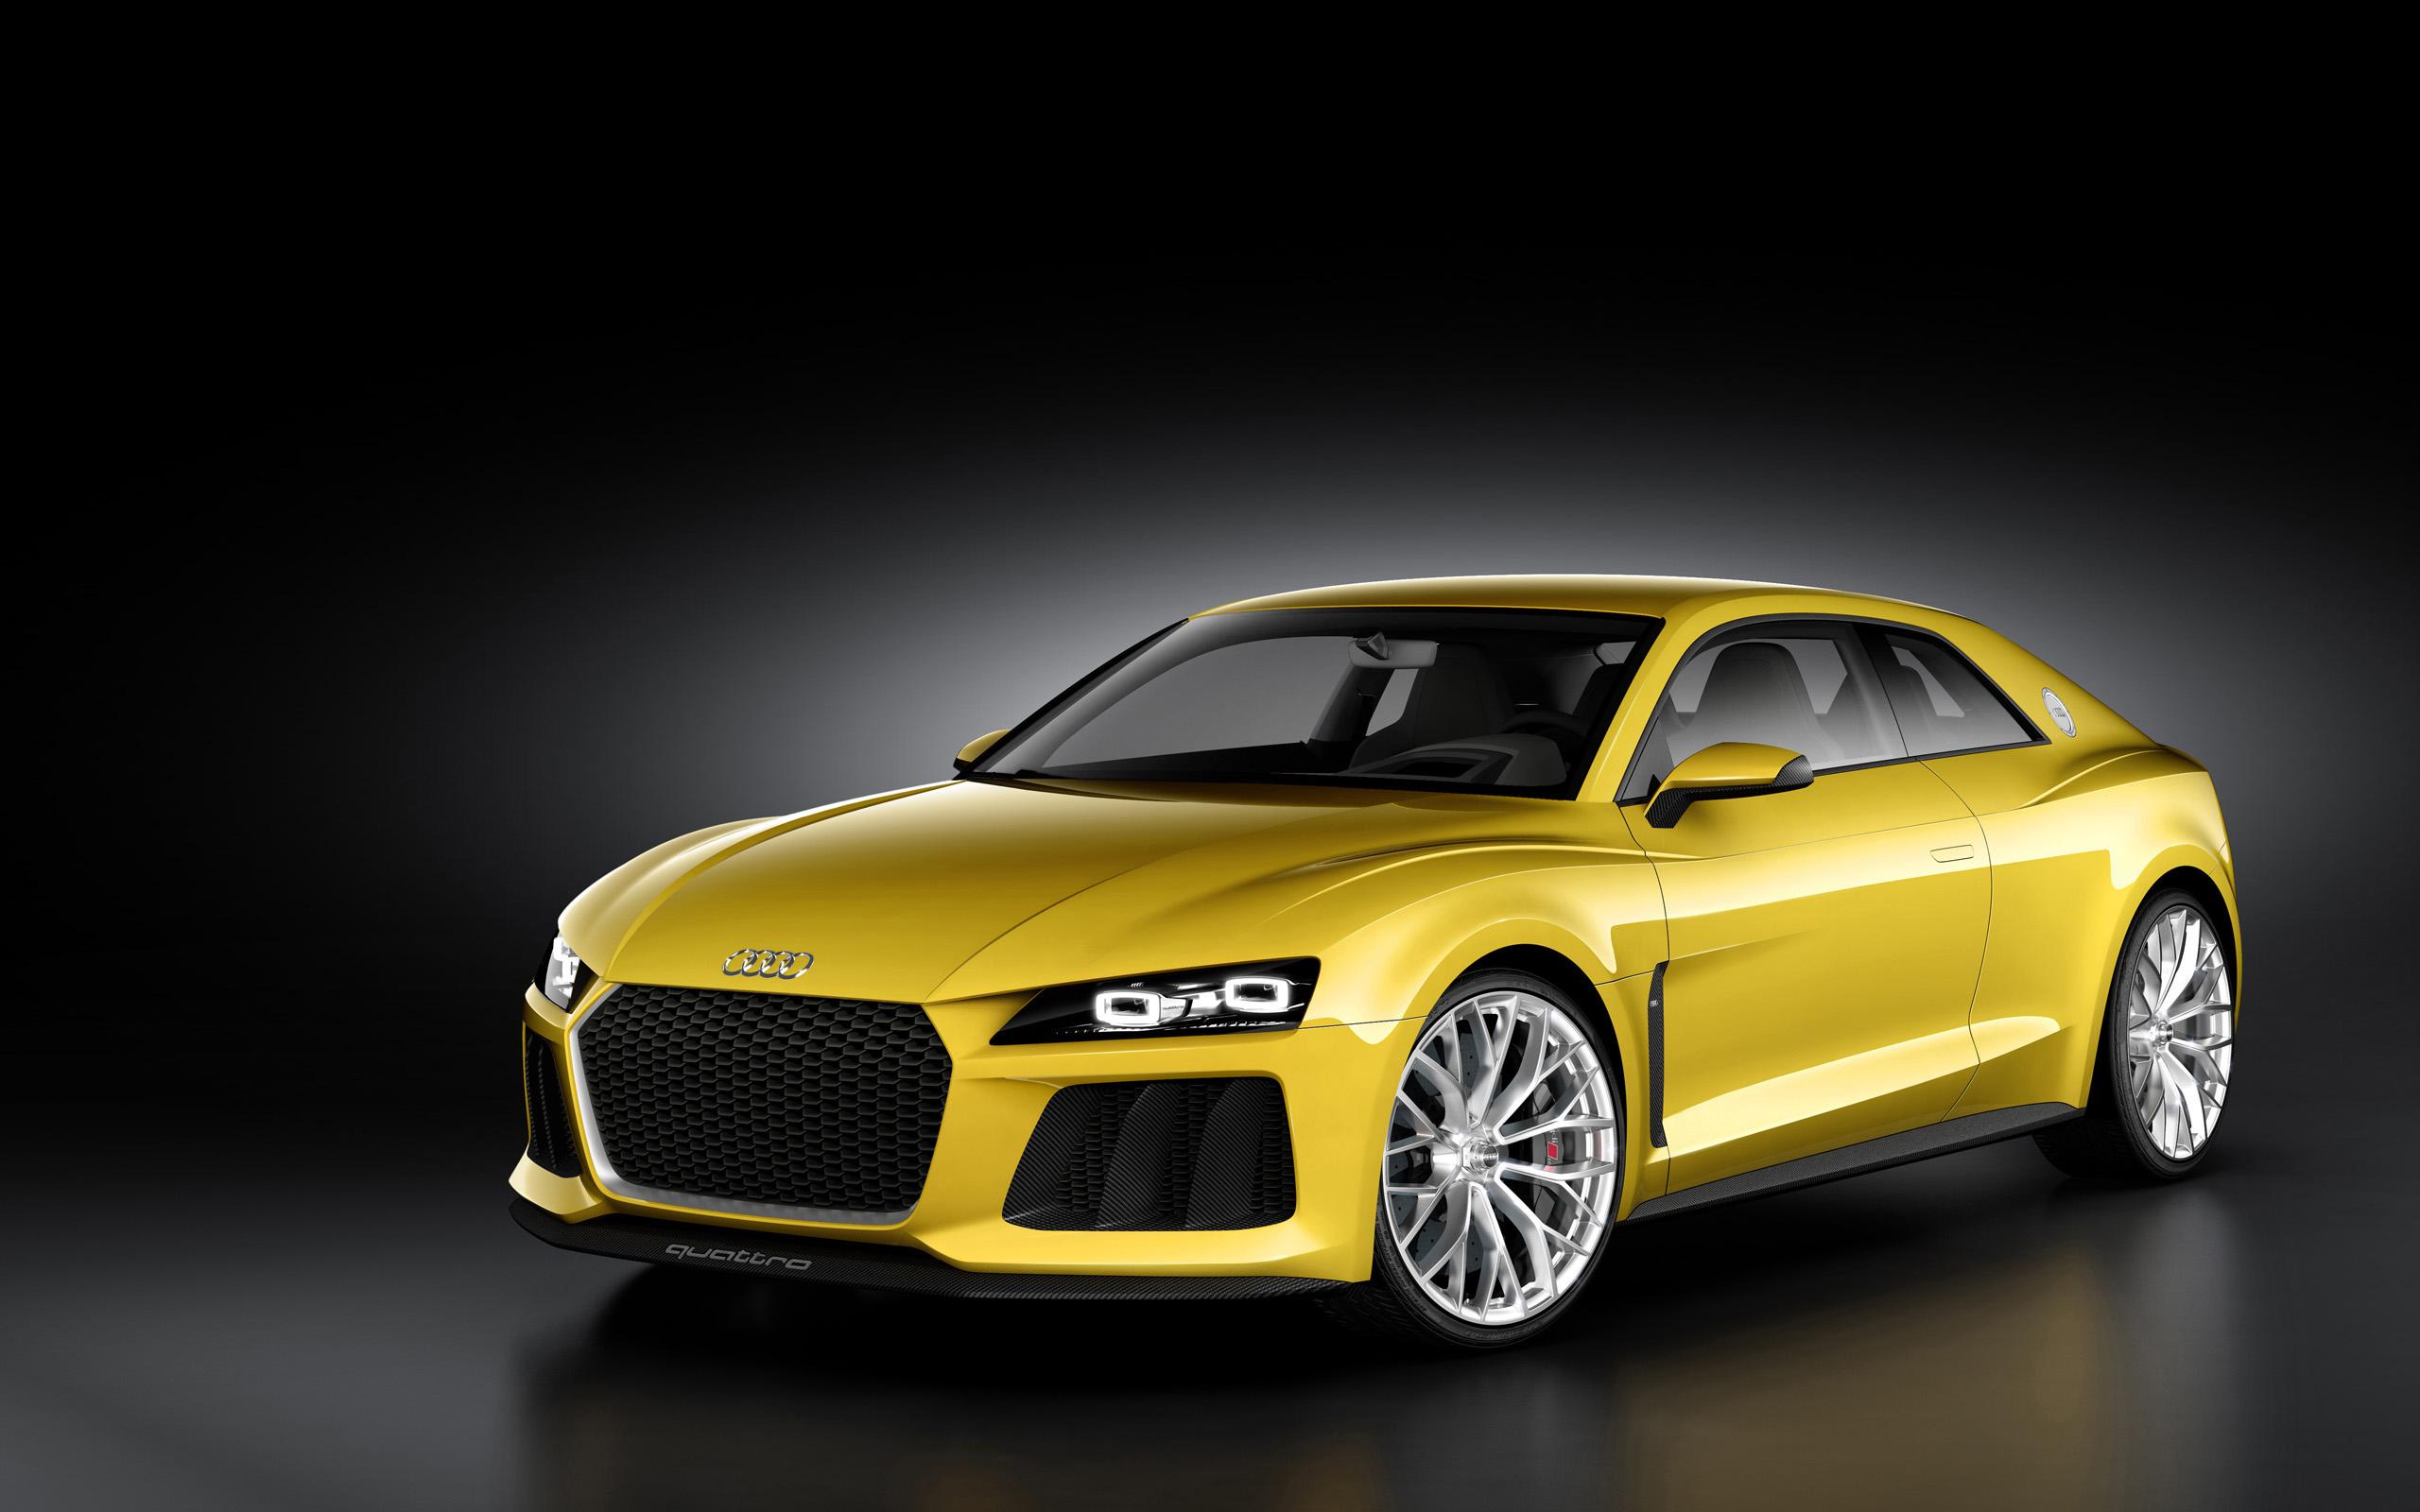 Audi Sport Wallpaper Iphone: 2013 Audi Sport Quattro Concept Wallpaper